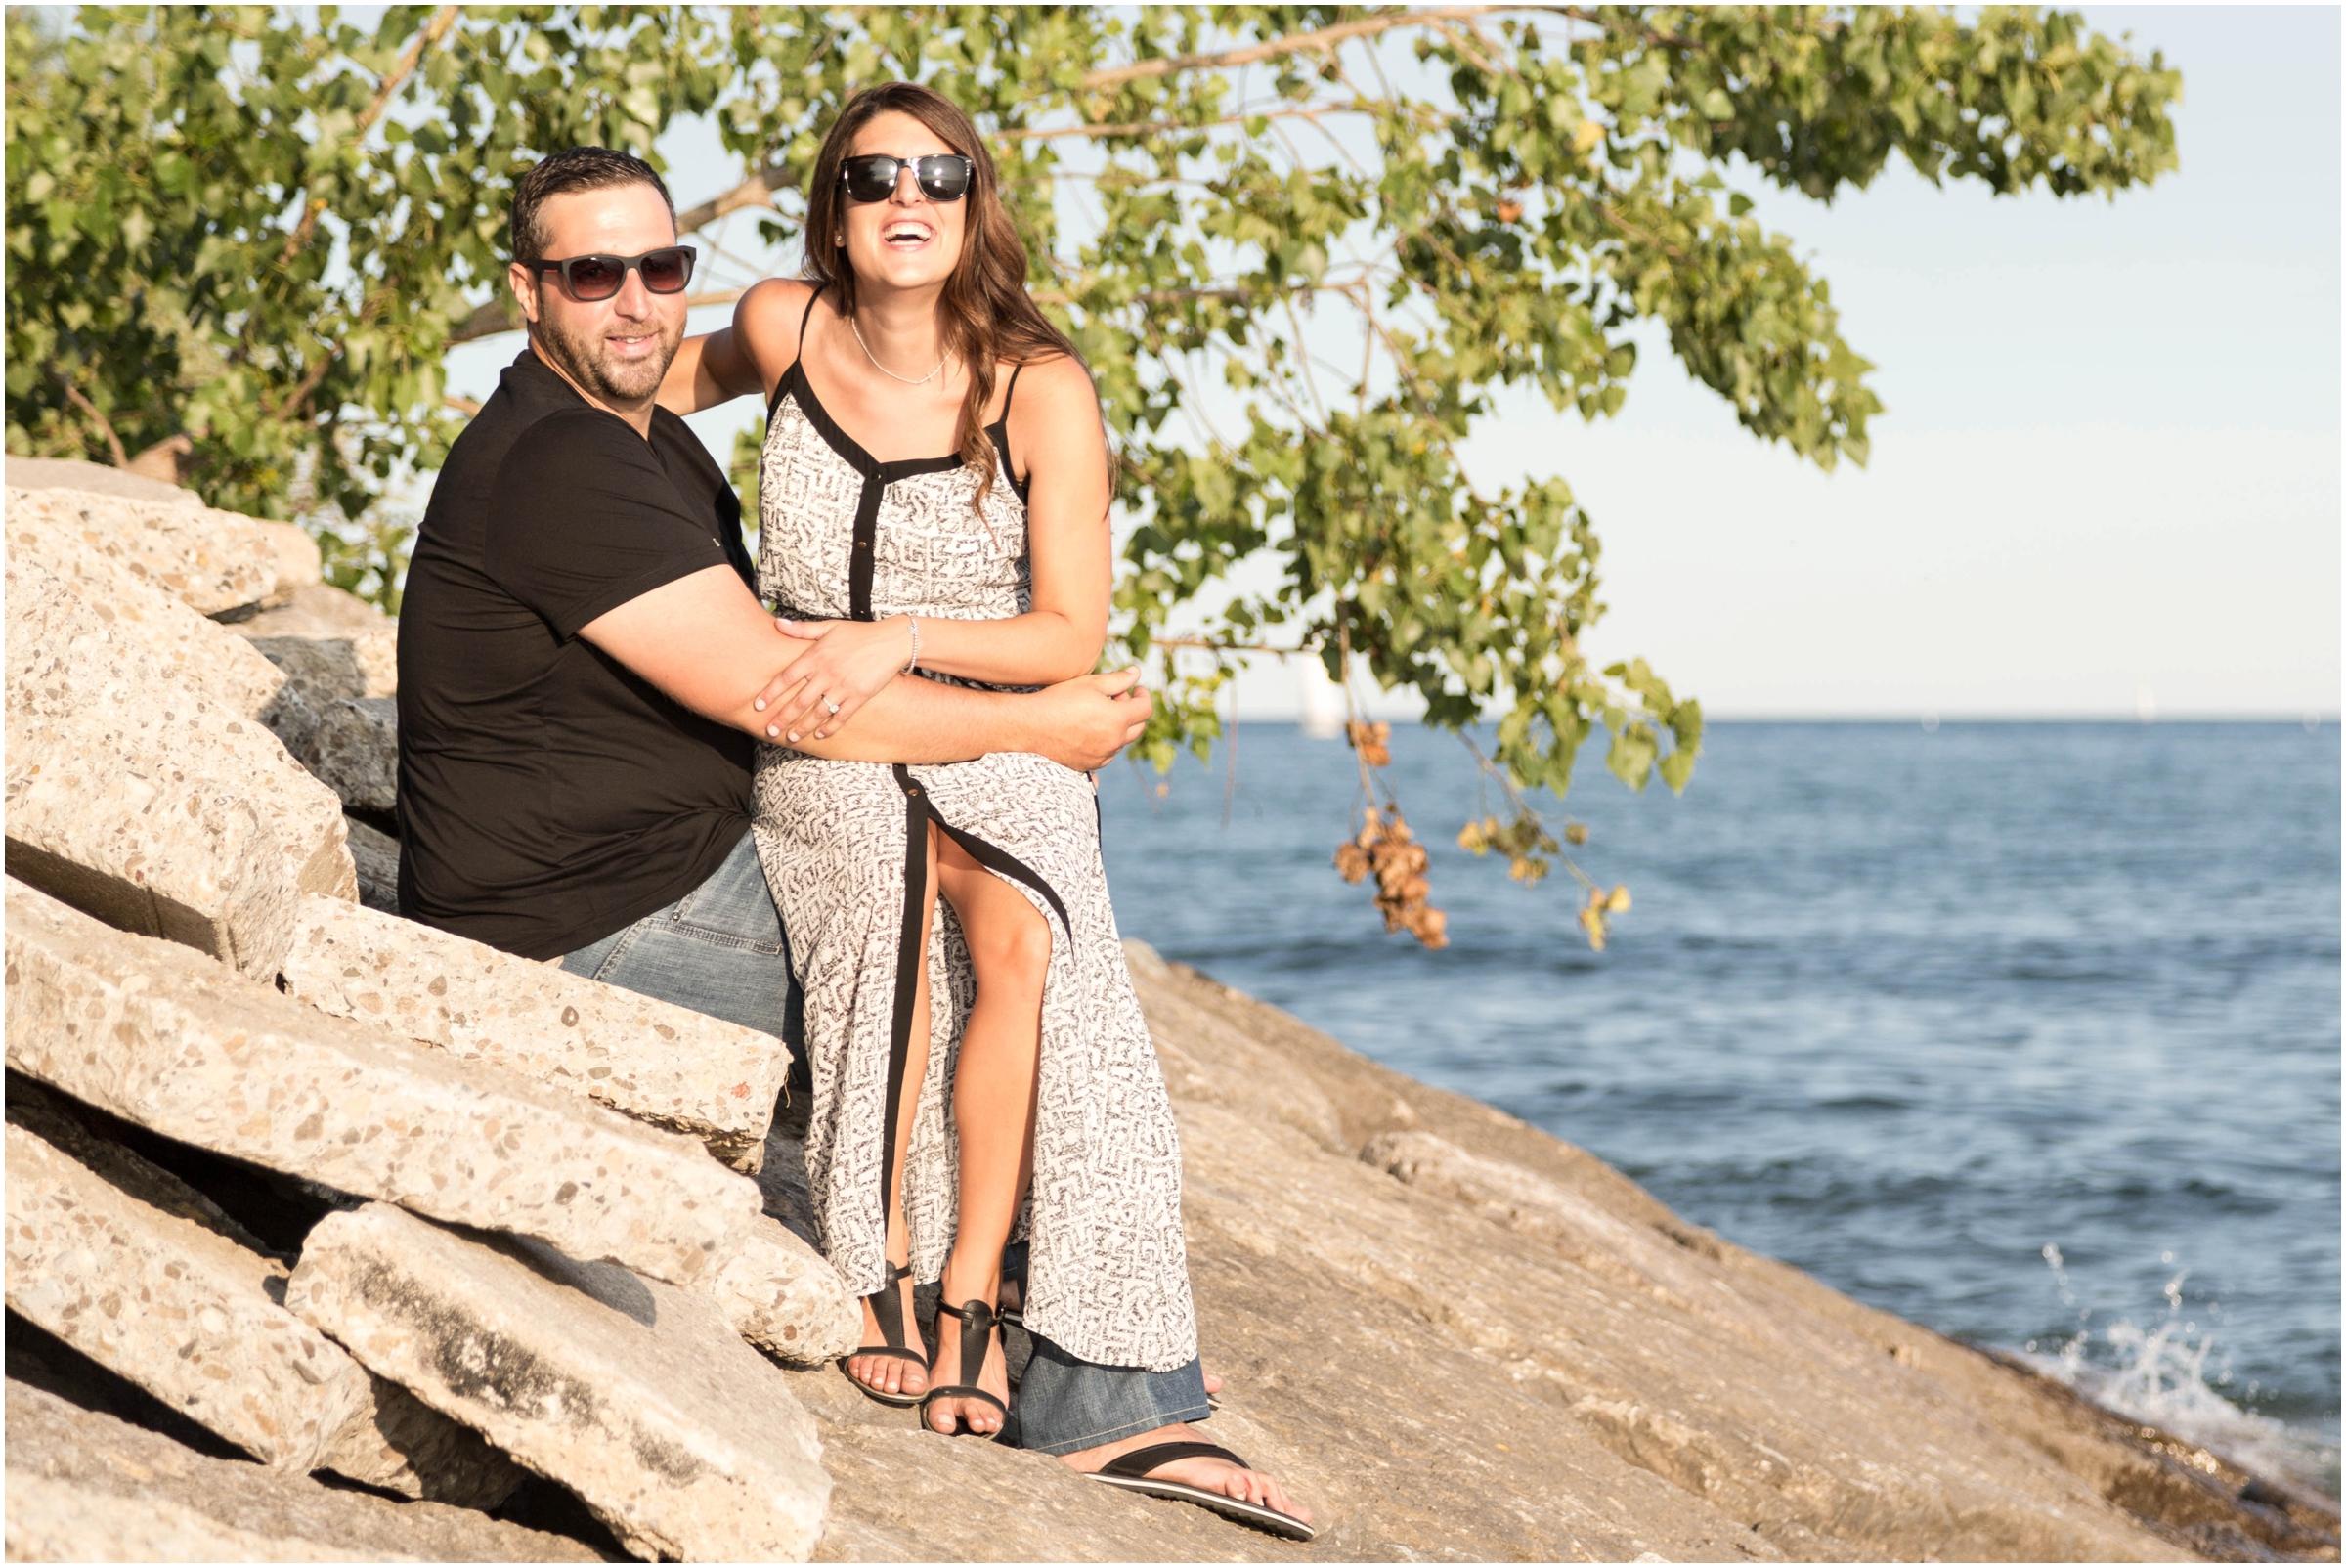 Cathy & Gianmarco 12.jpg